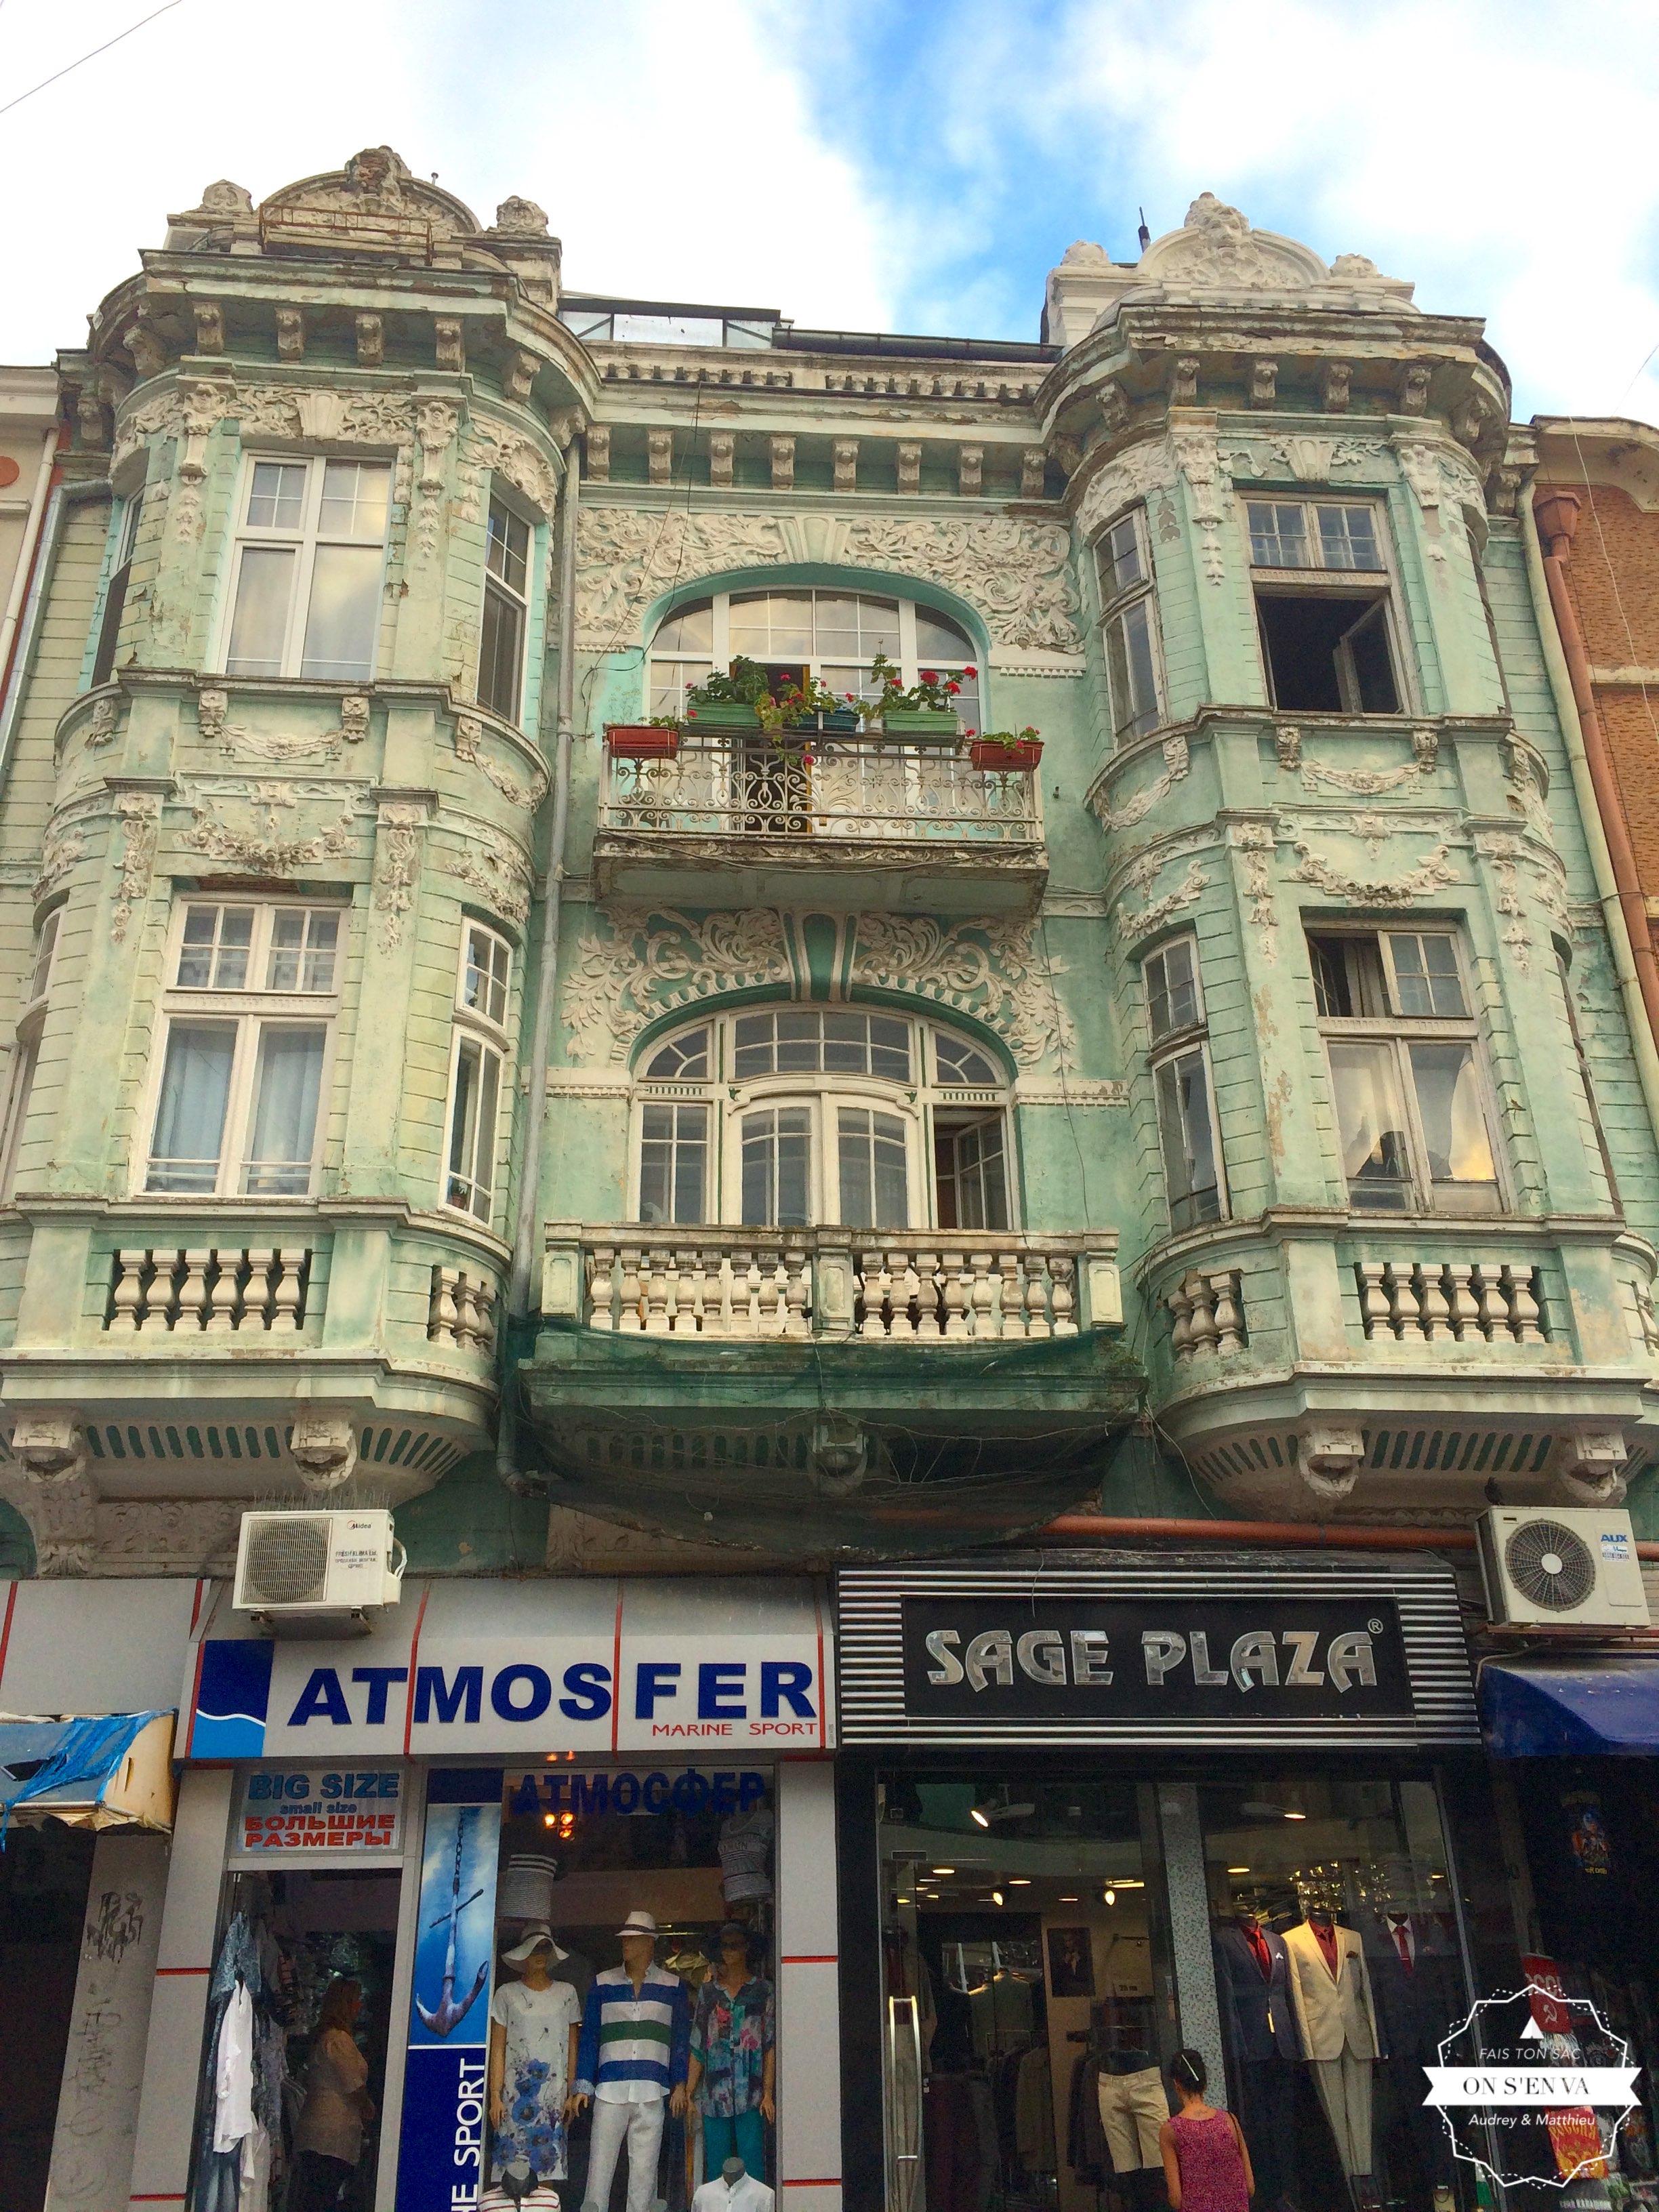 Les immeubles de Varna